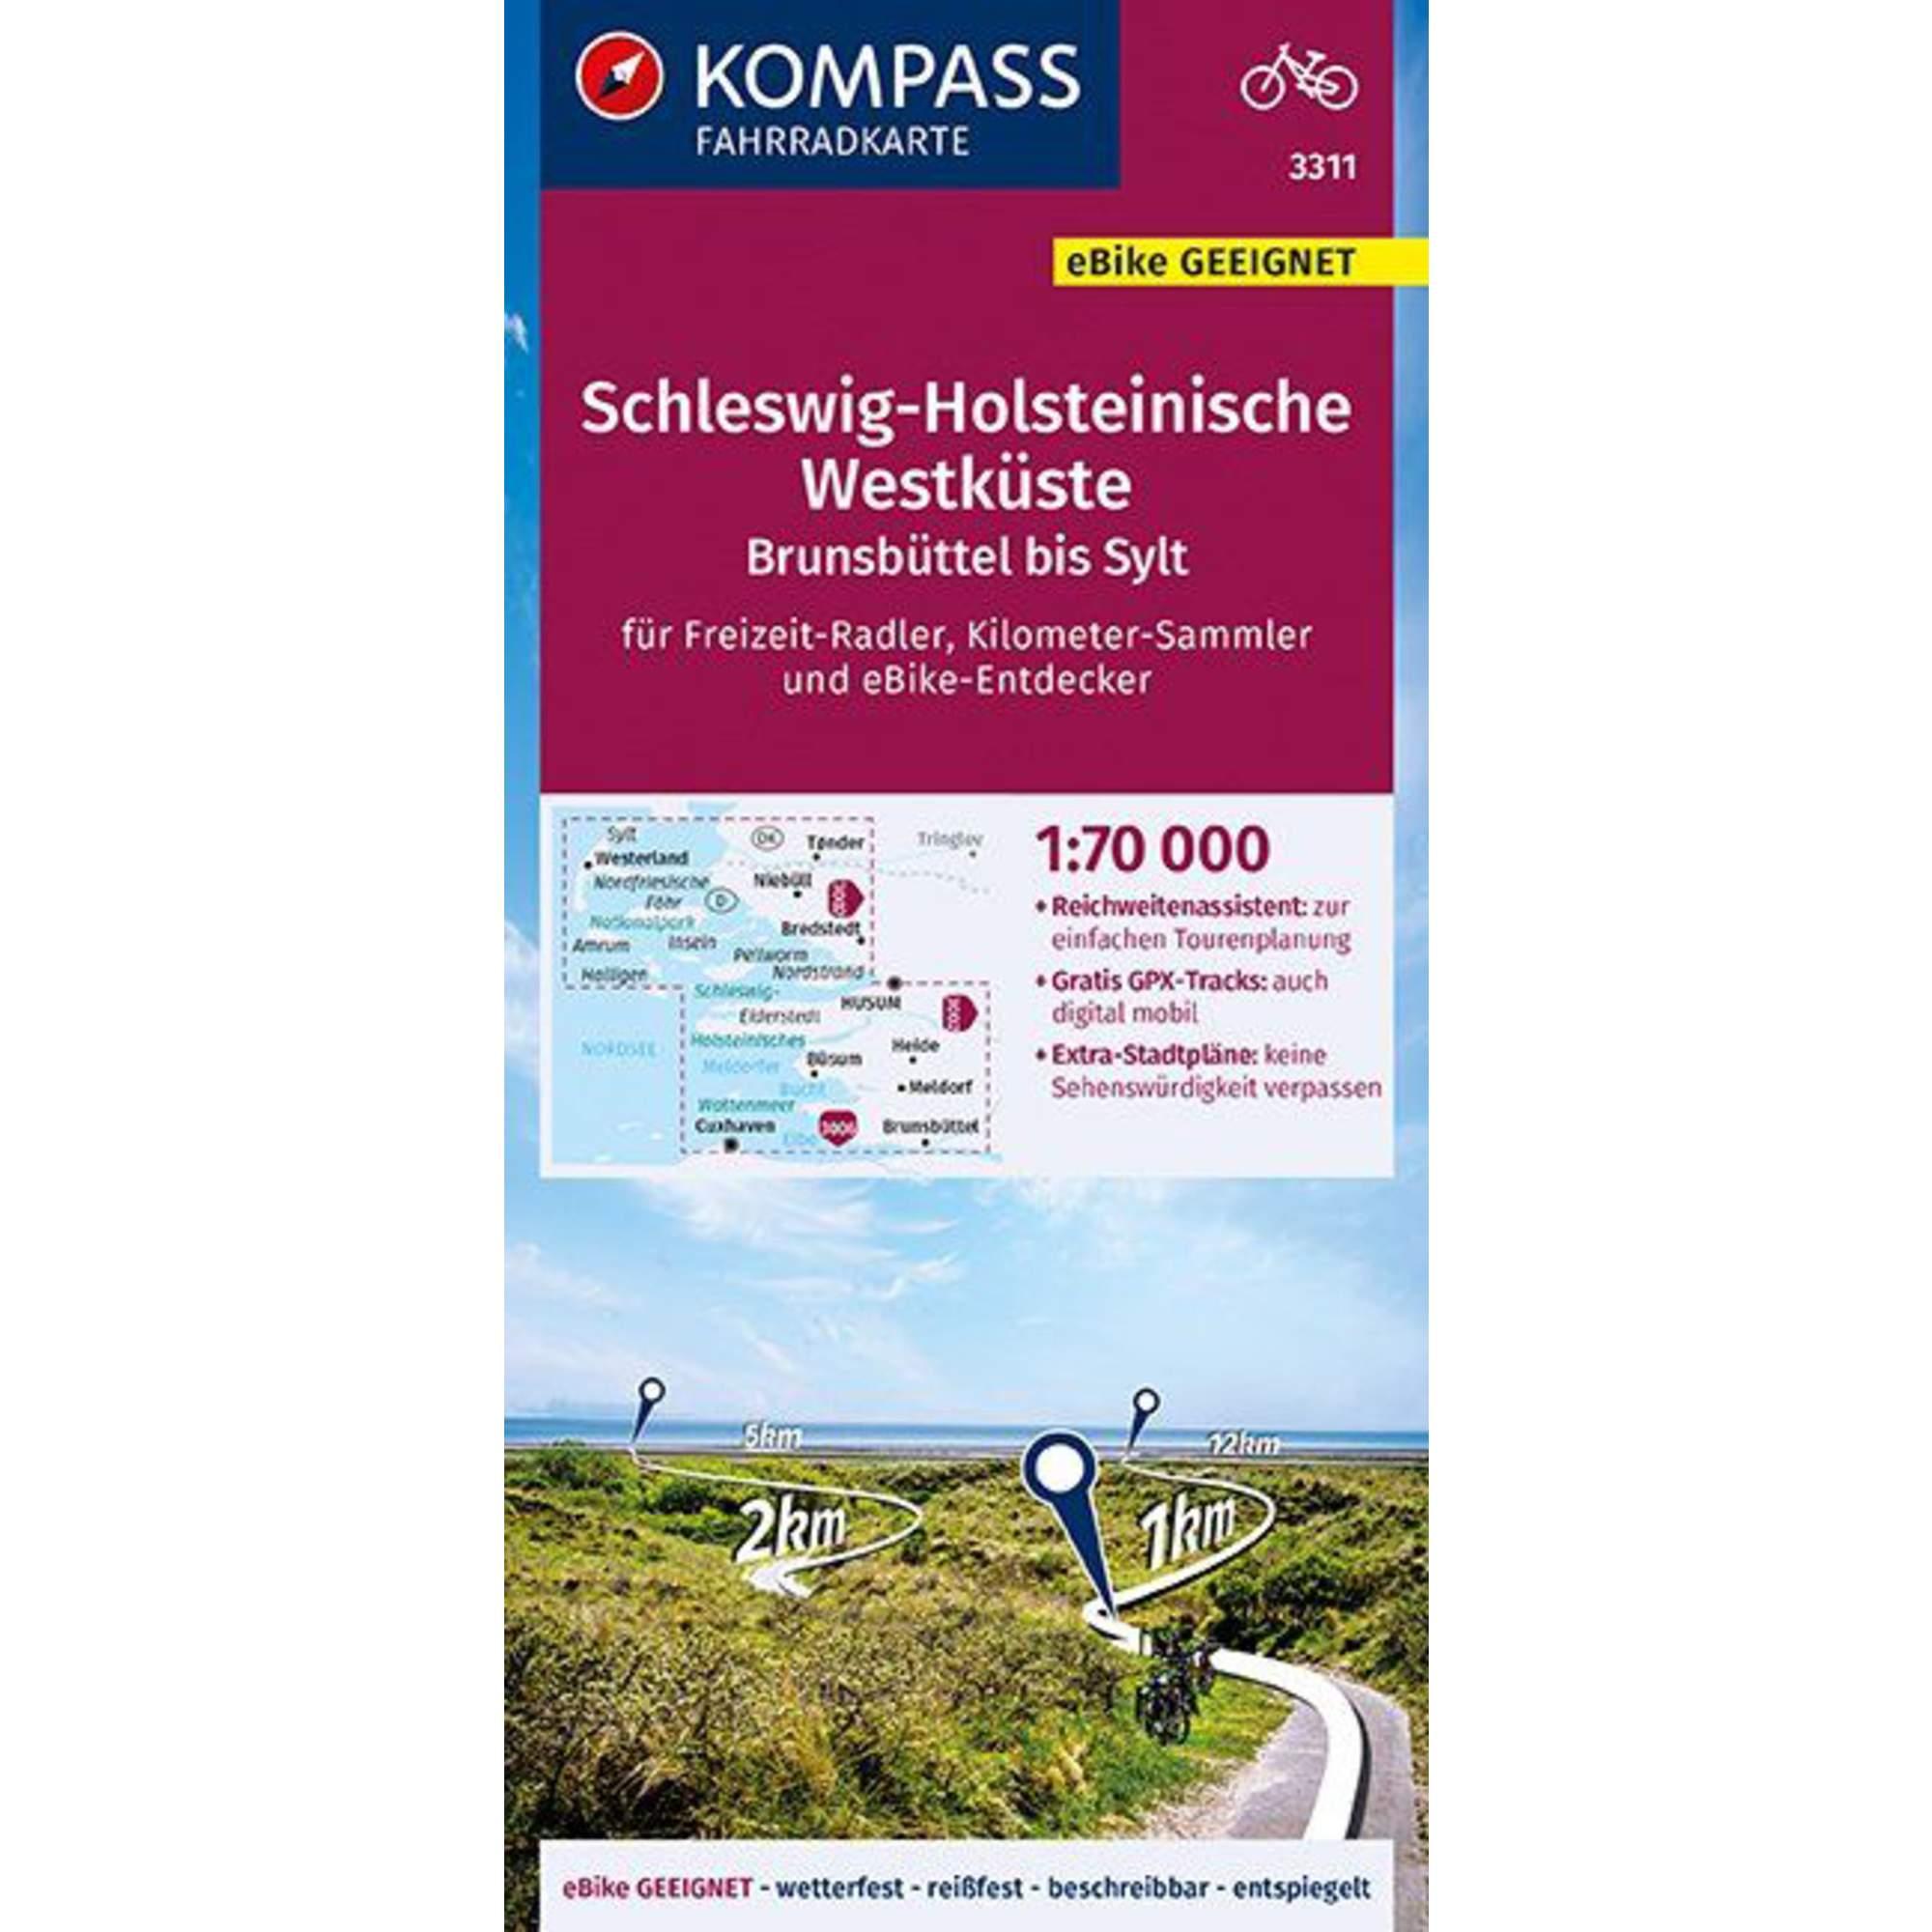 KOMPASS FAHRRADKARTE SCHLESWIG-HOLSTEINI -  Fahrradkarten